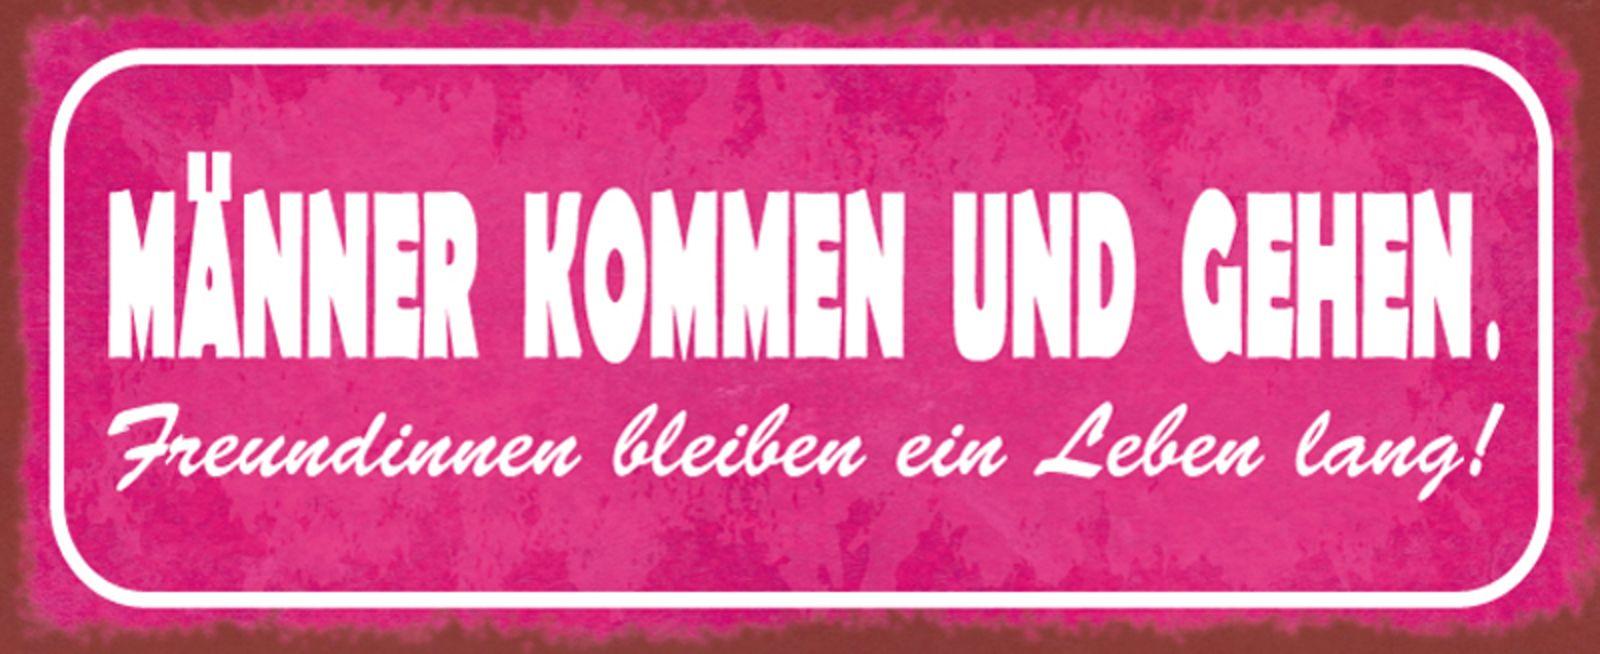 Blechschild Spruch Manner Gehen Freundinnen Bleiben Metallschild 27x10 Cm Wanddeko Tin Sign Kaufen Bei Comcard Gmbh